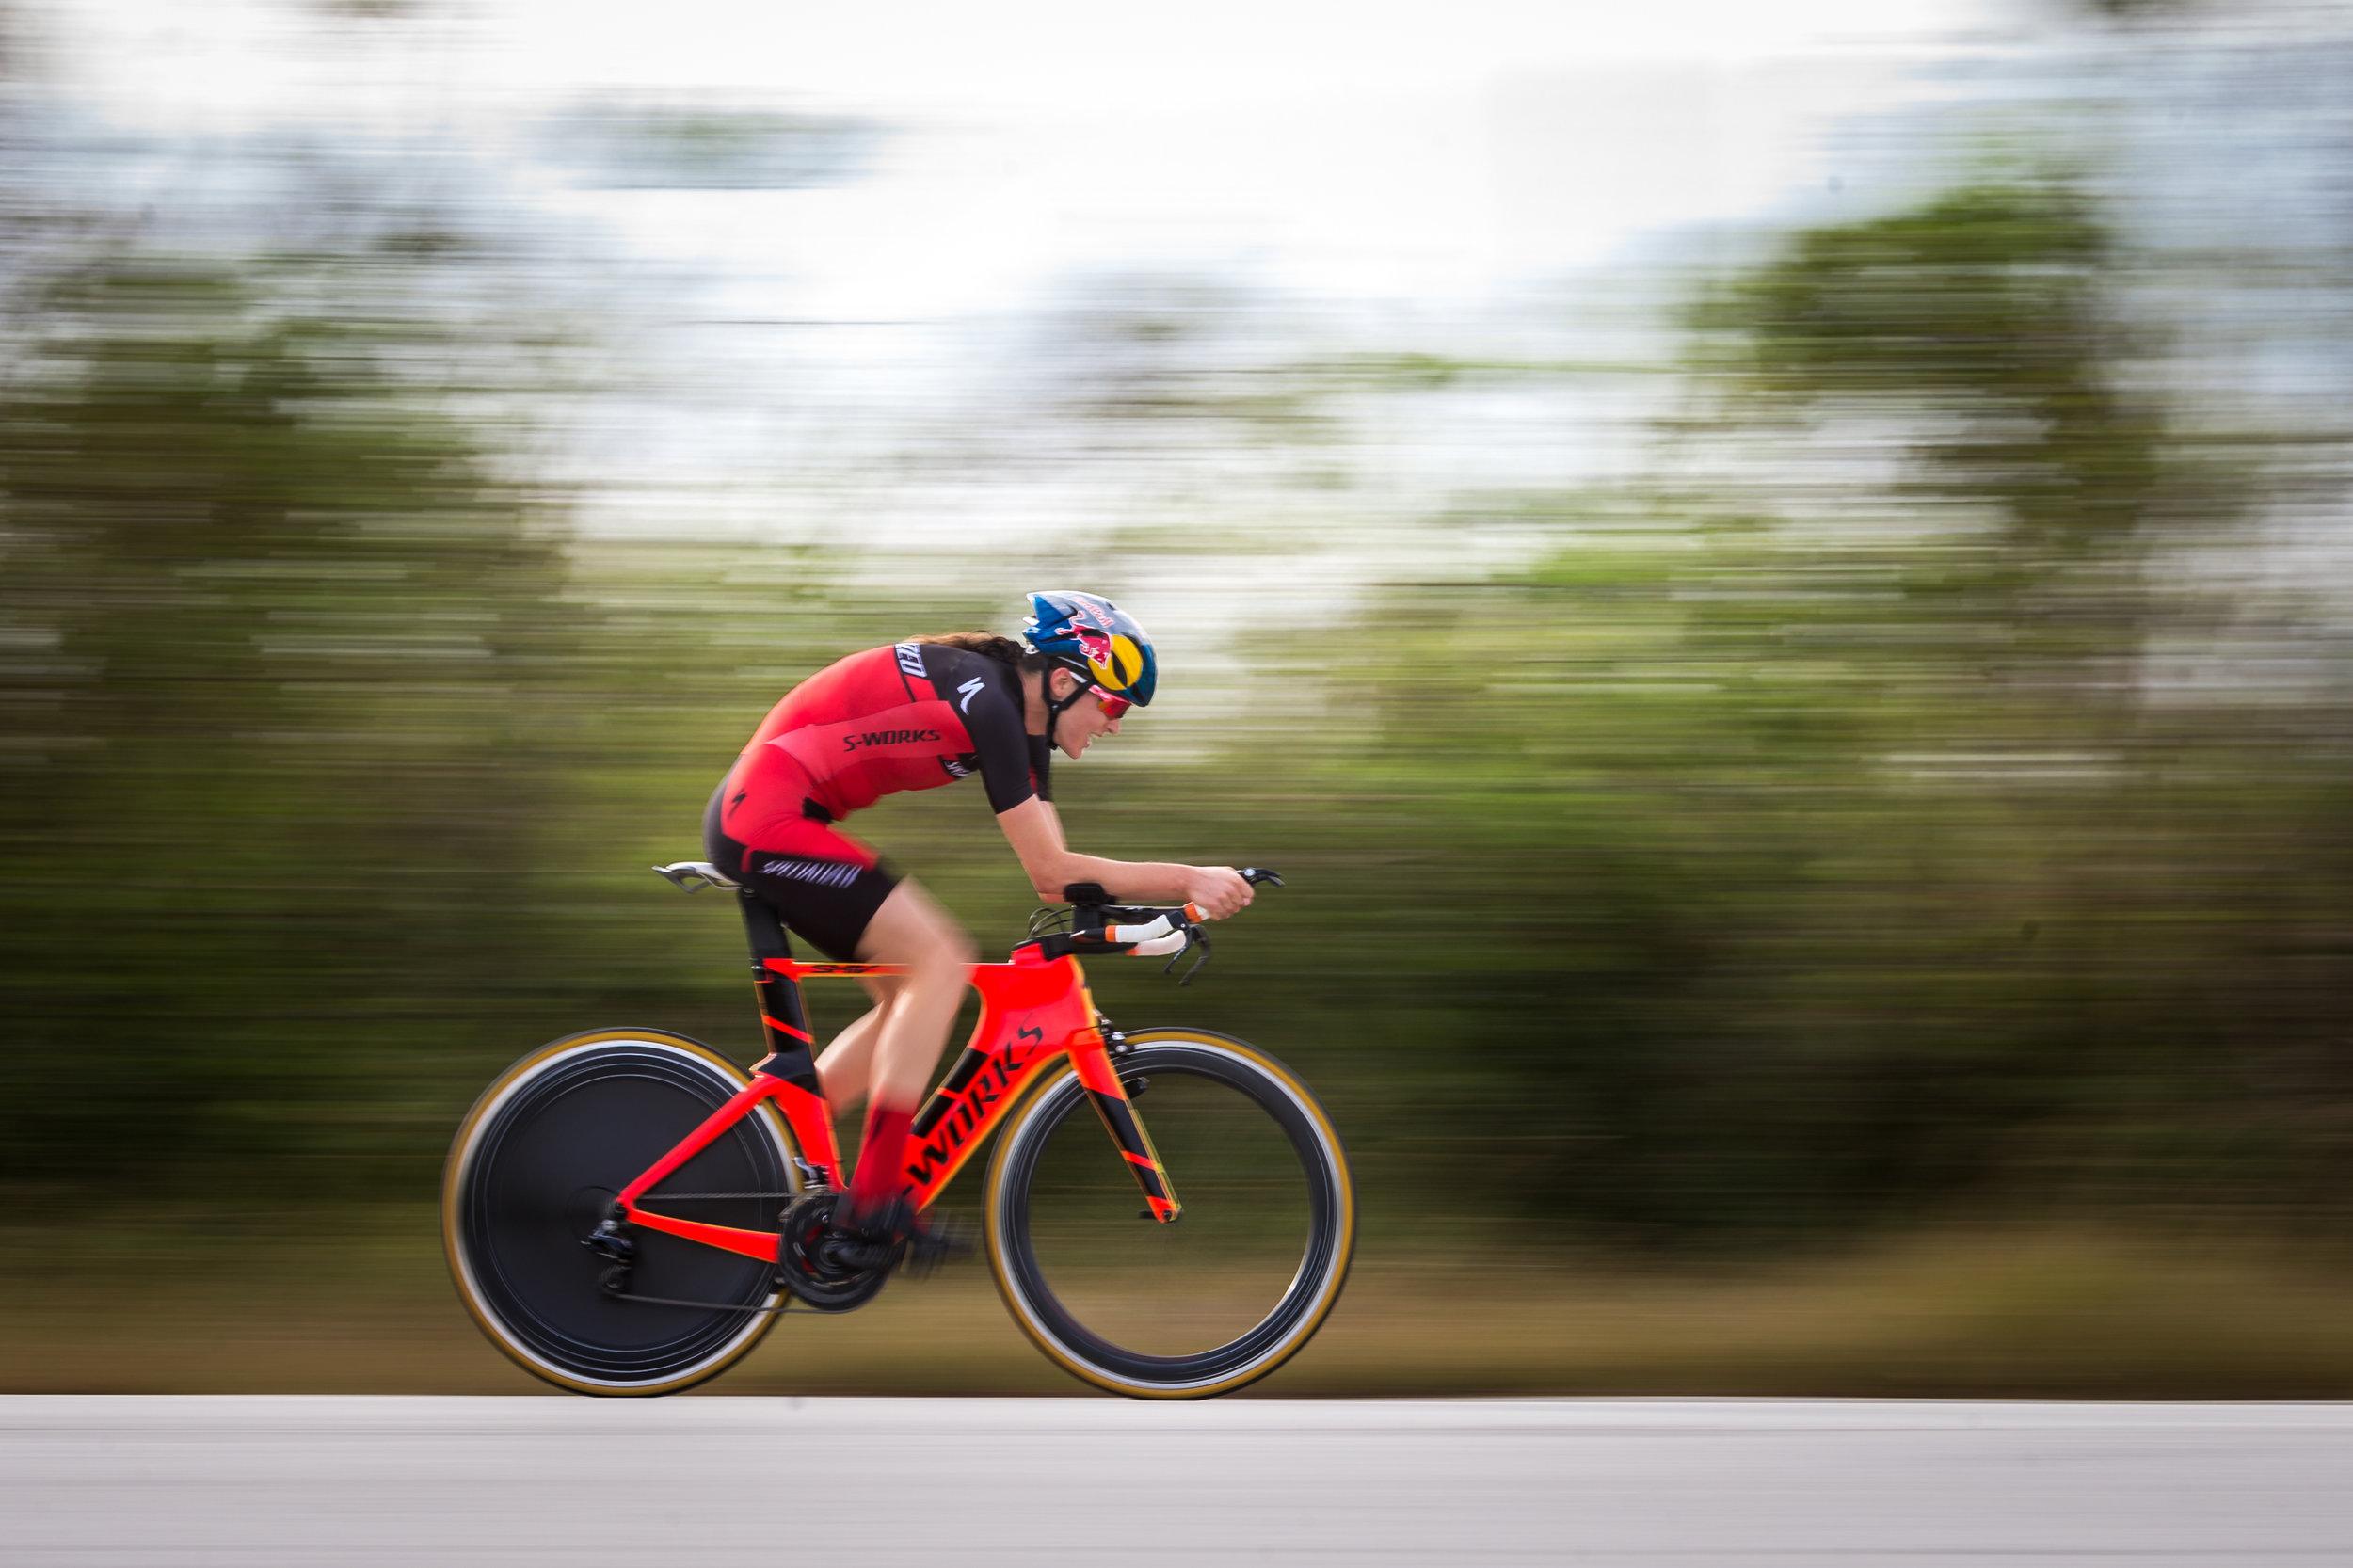 Island House Triathlon TT bike on day 1